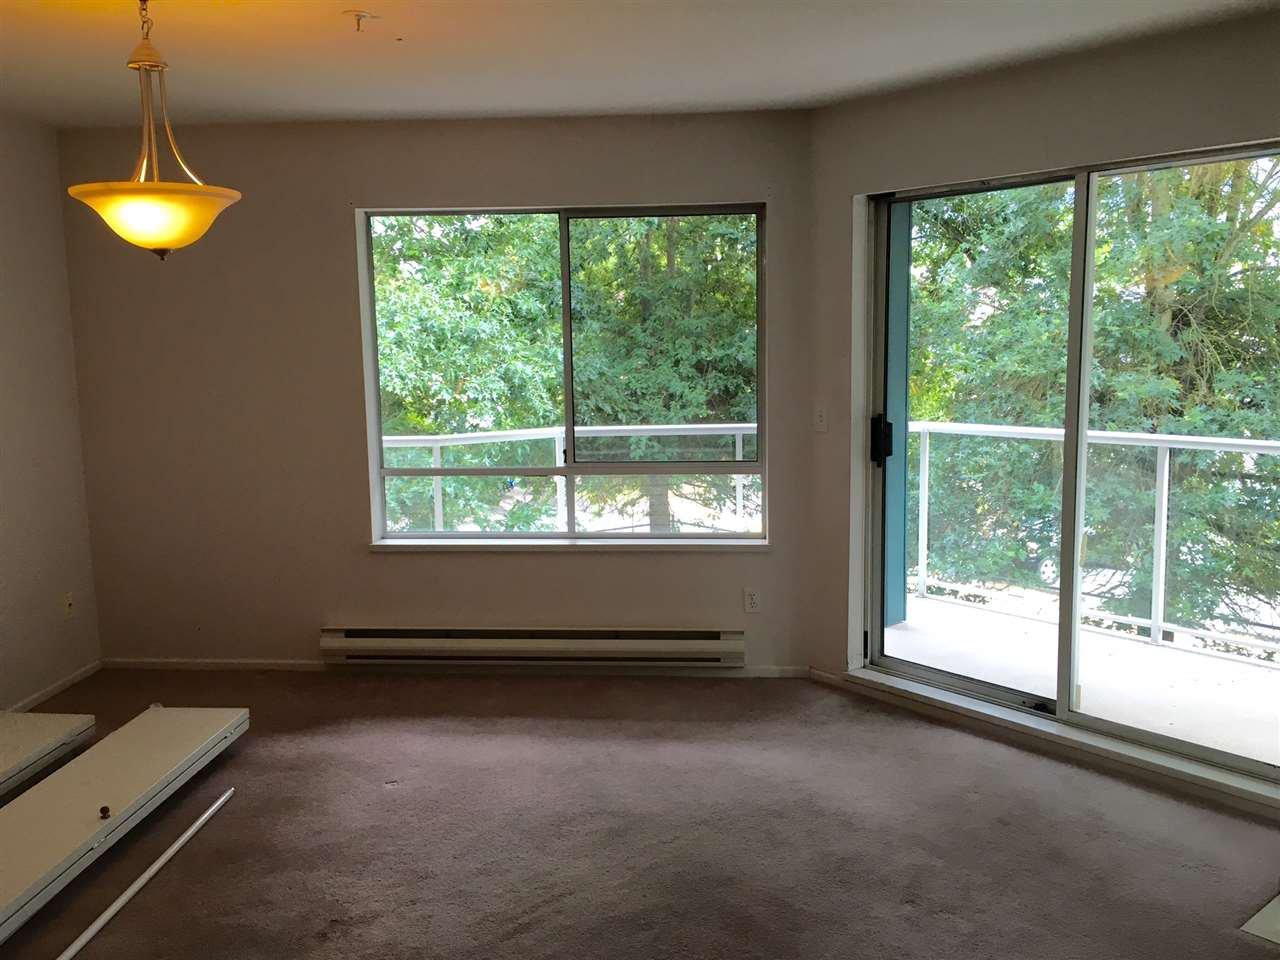 "Photo 5: Photos: 207 27358 32 Avenue in Langley: Aldergrove Langley Condo for sale in ""Willow Creek"" : MLS®# R2207746"